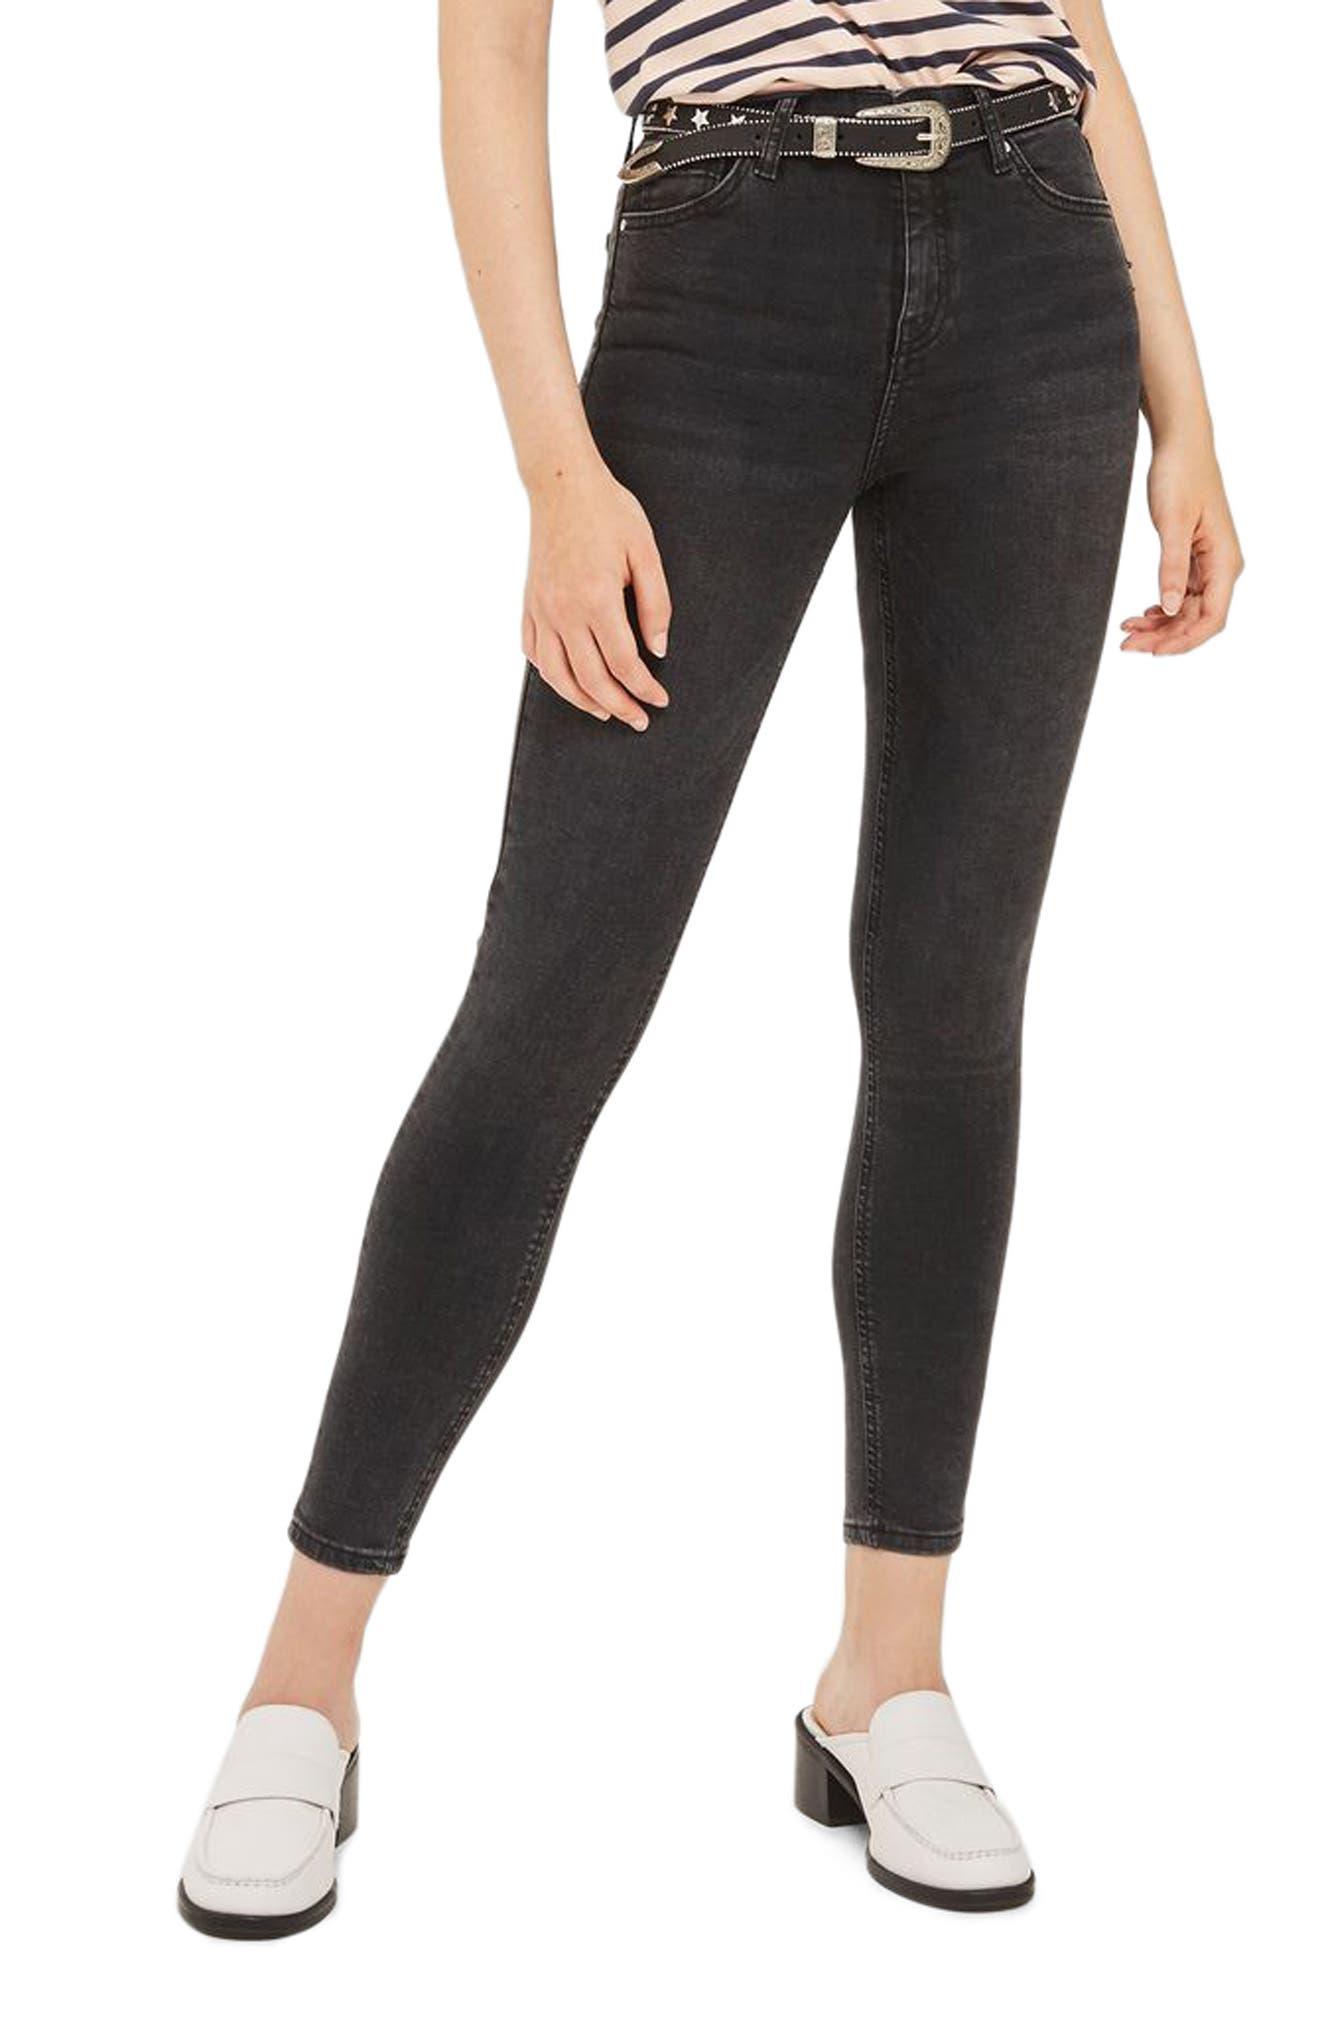 Alternate Image 1 Selected - Topshop Jamie High Waist Ankle Skinny Jeans